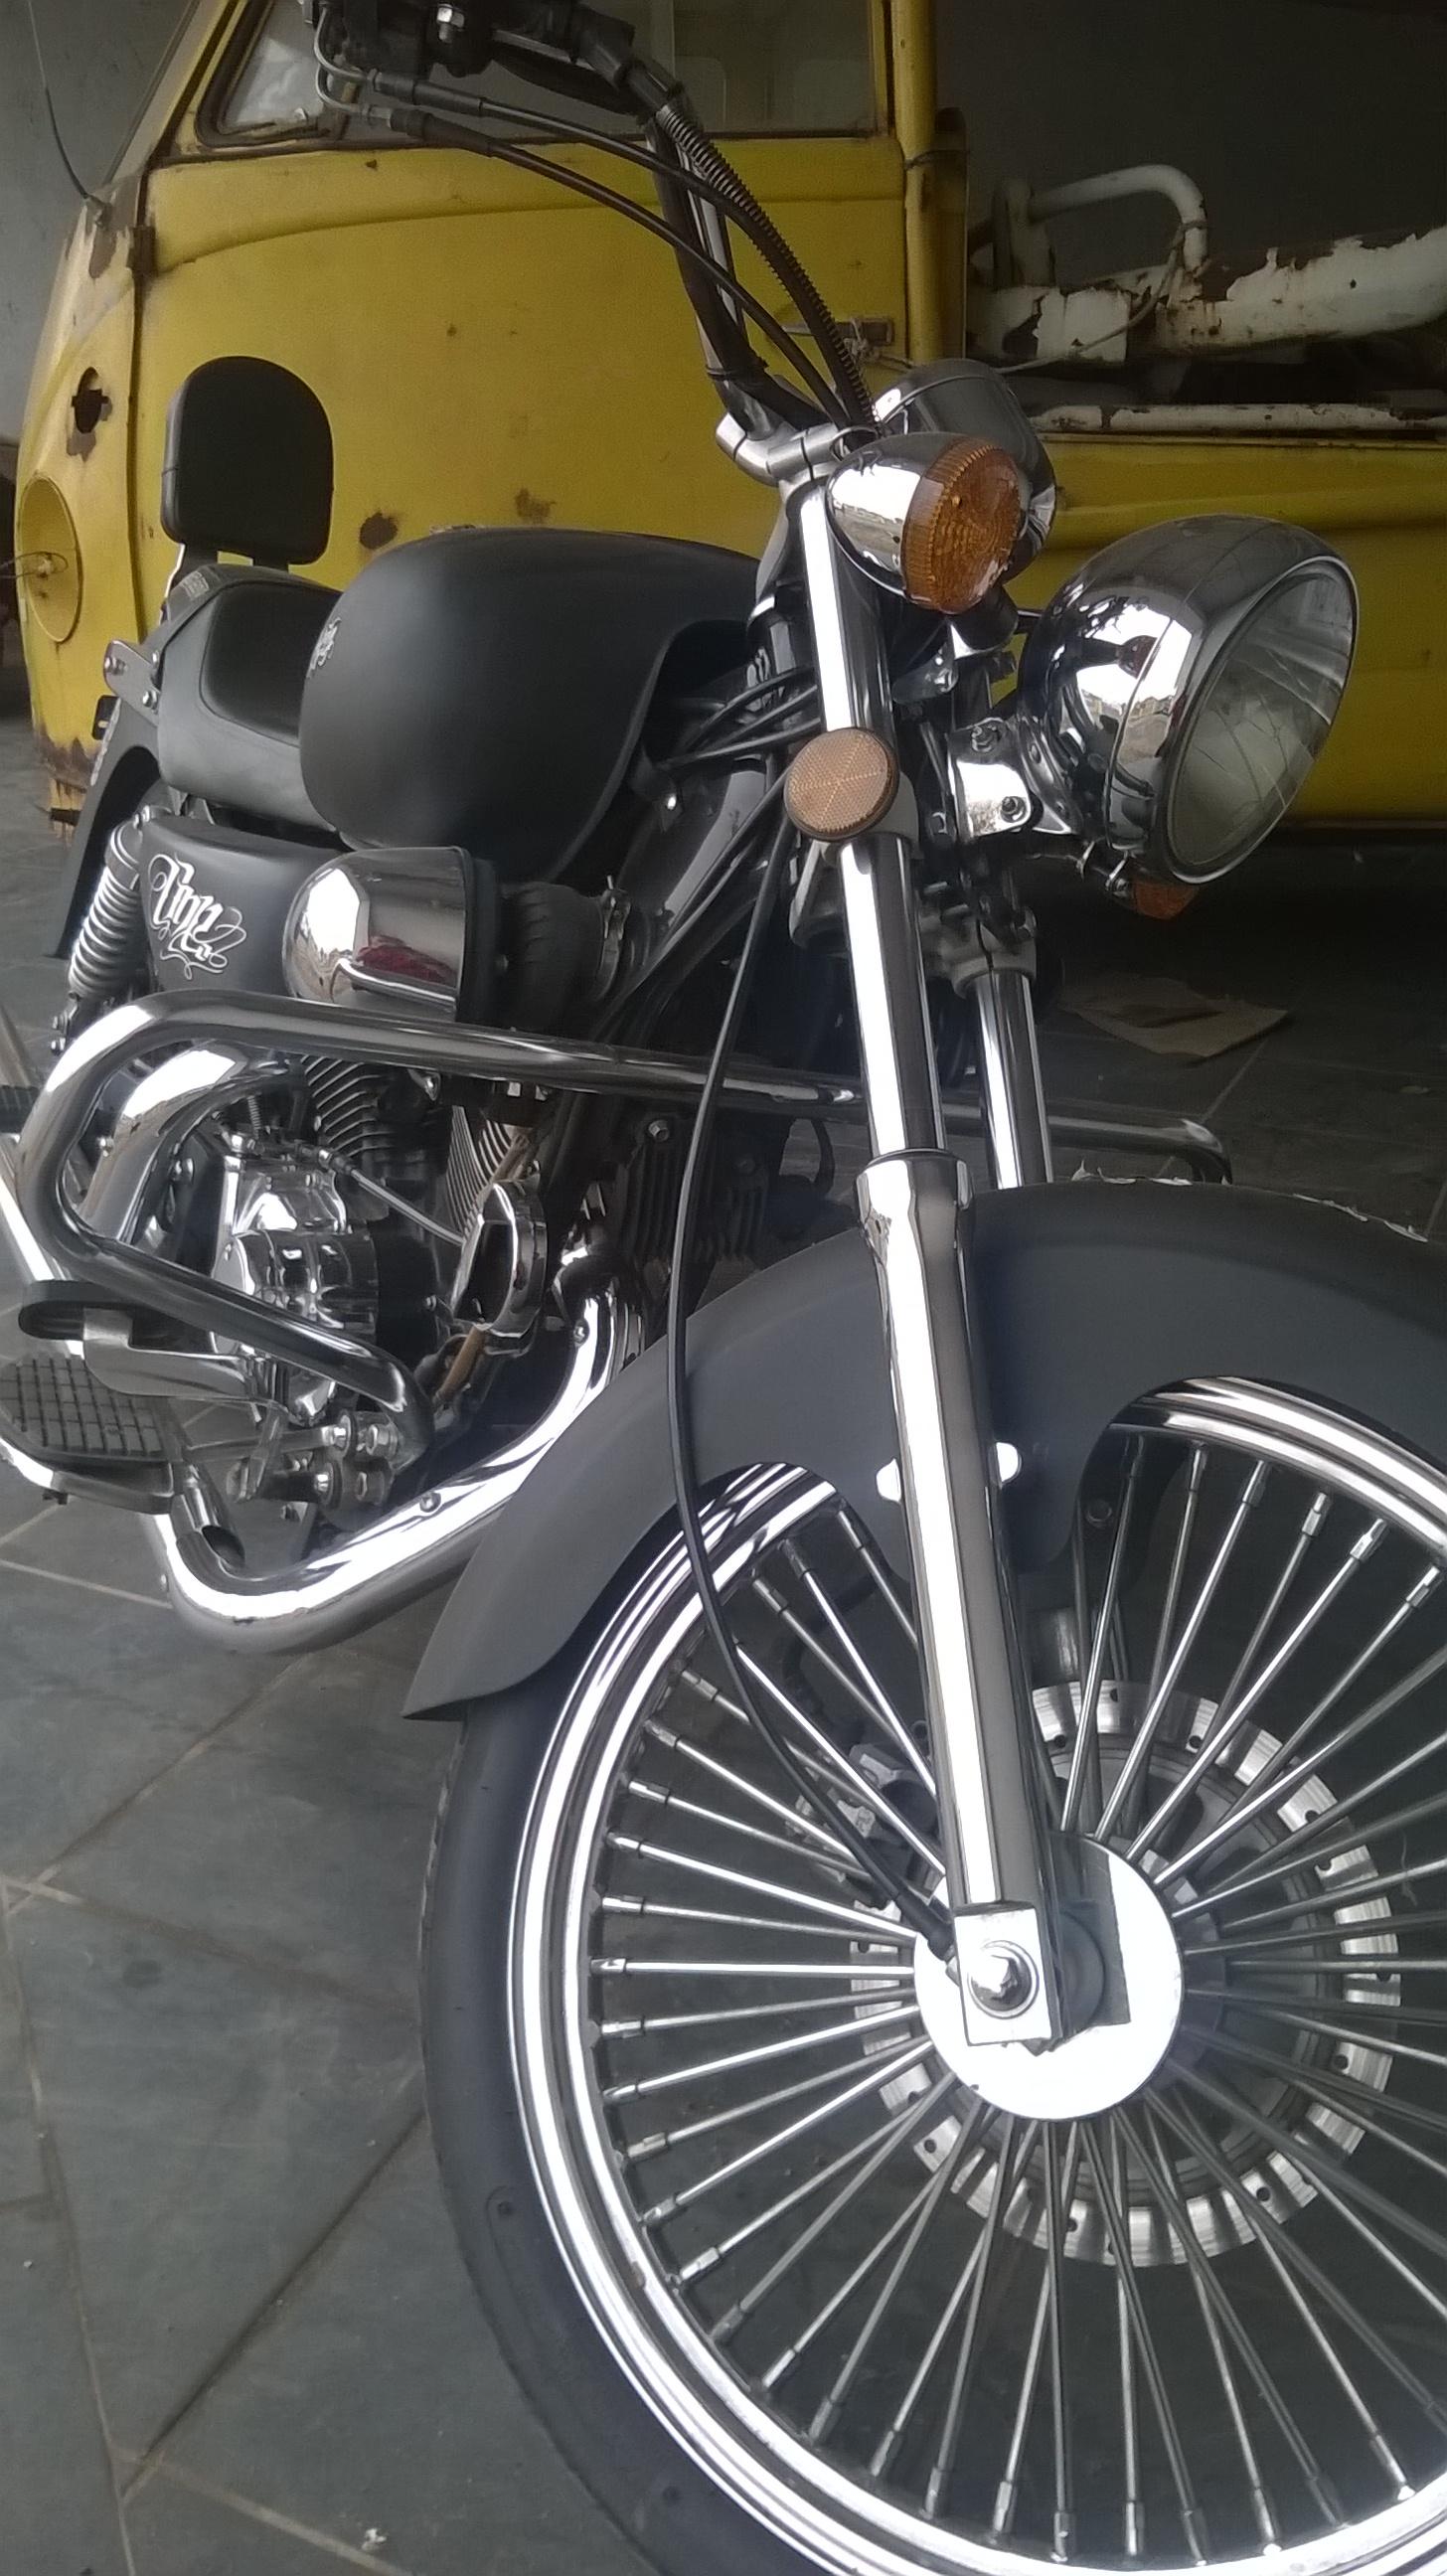 250cc Big Boy In Bikes In South Africa Junk Mail